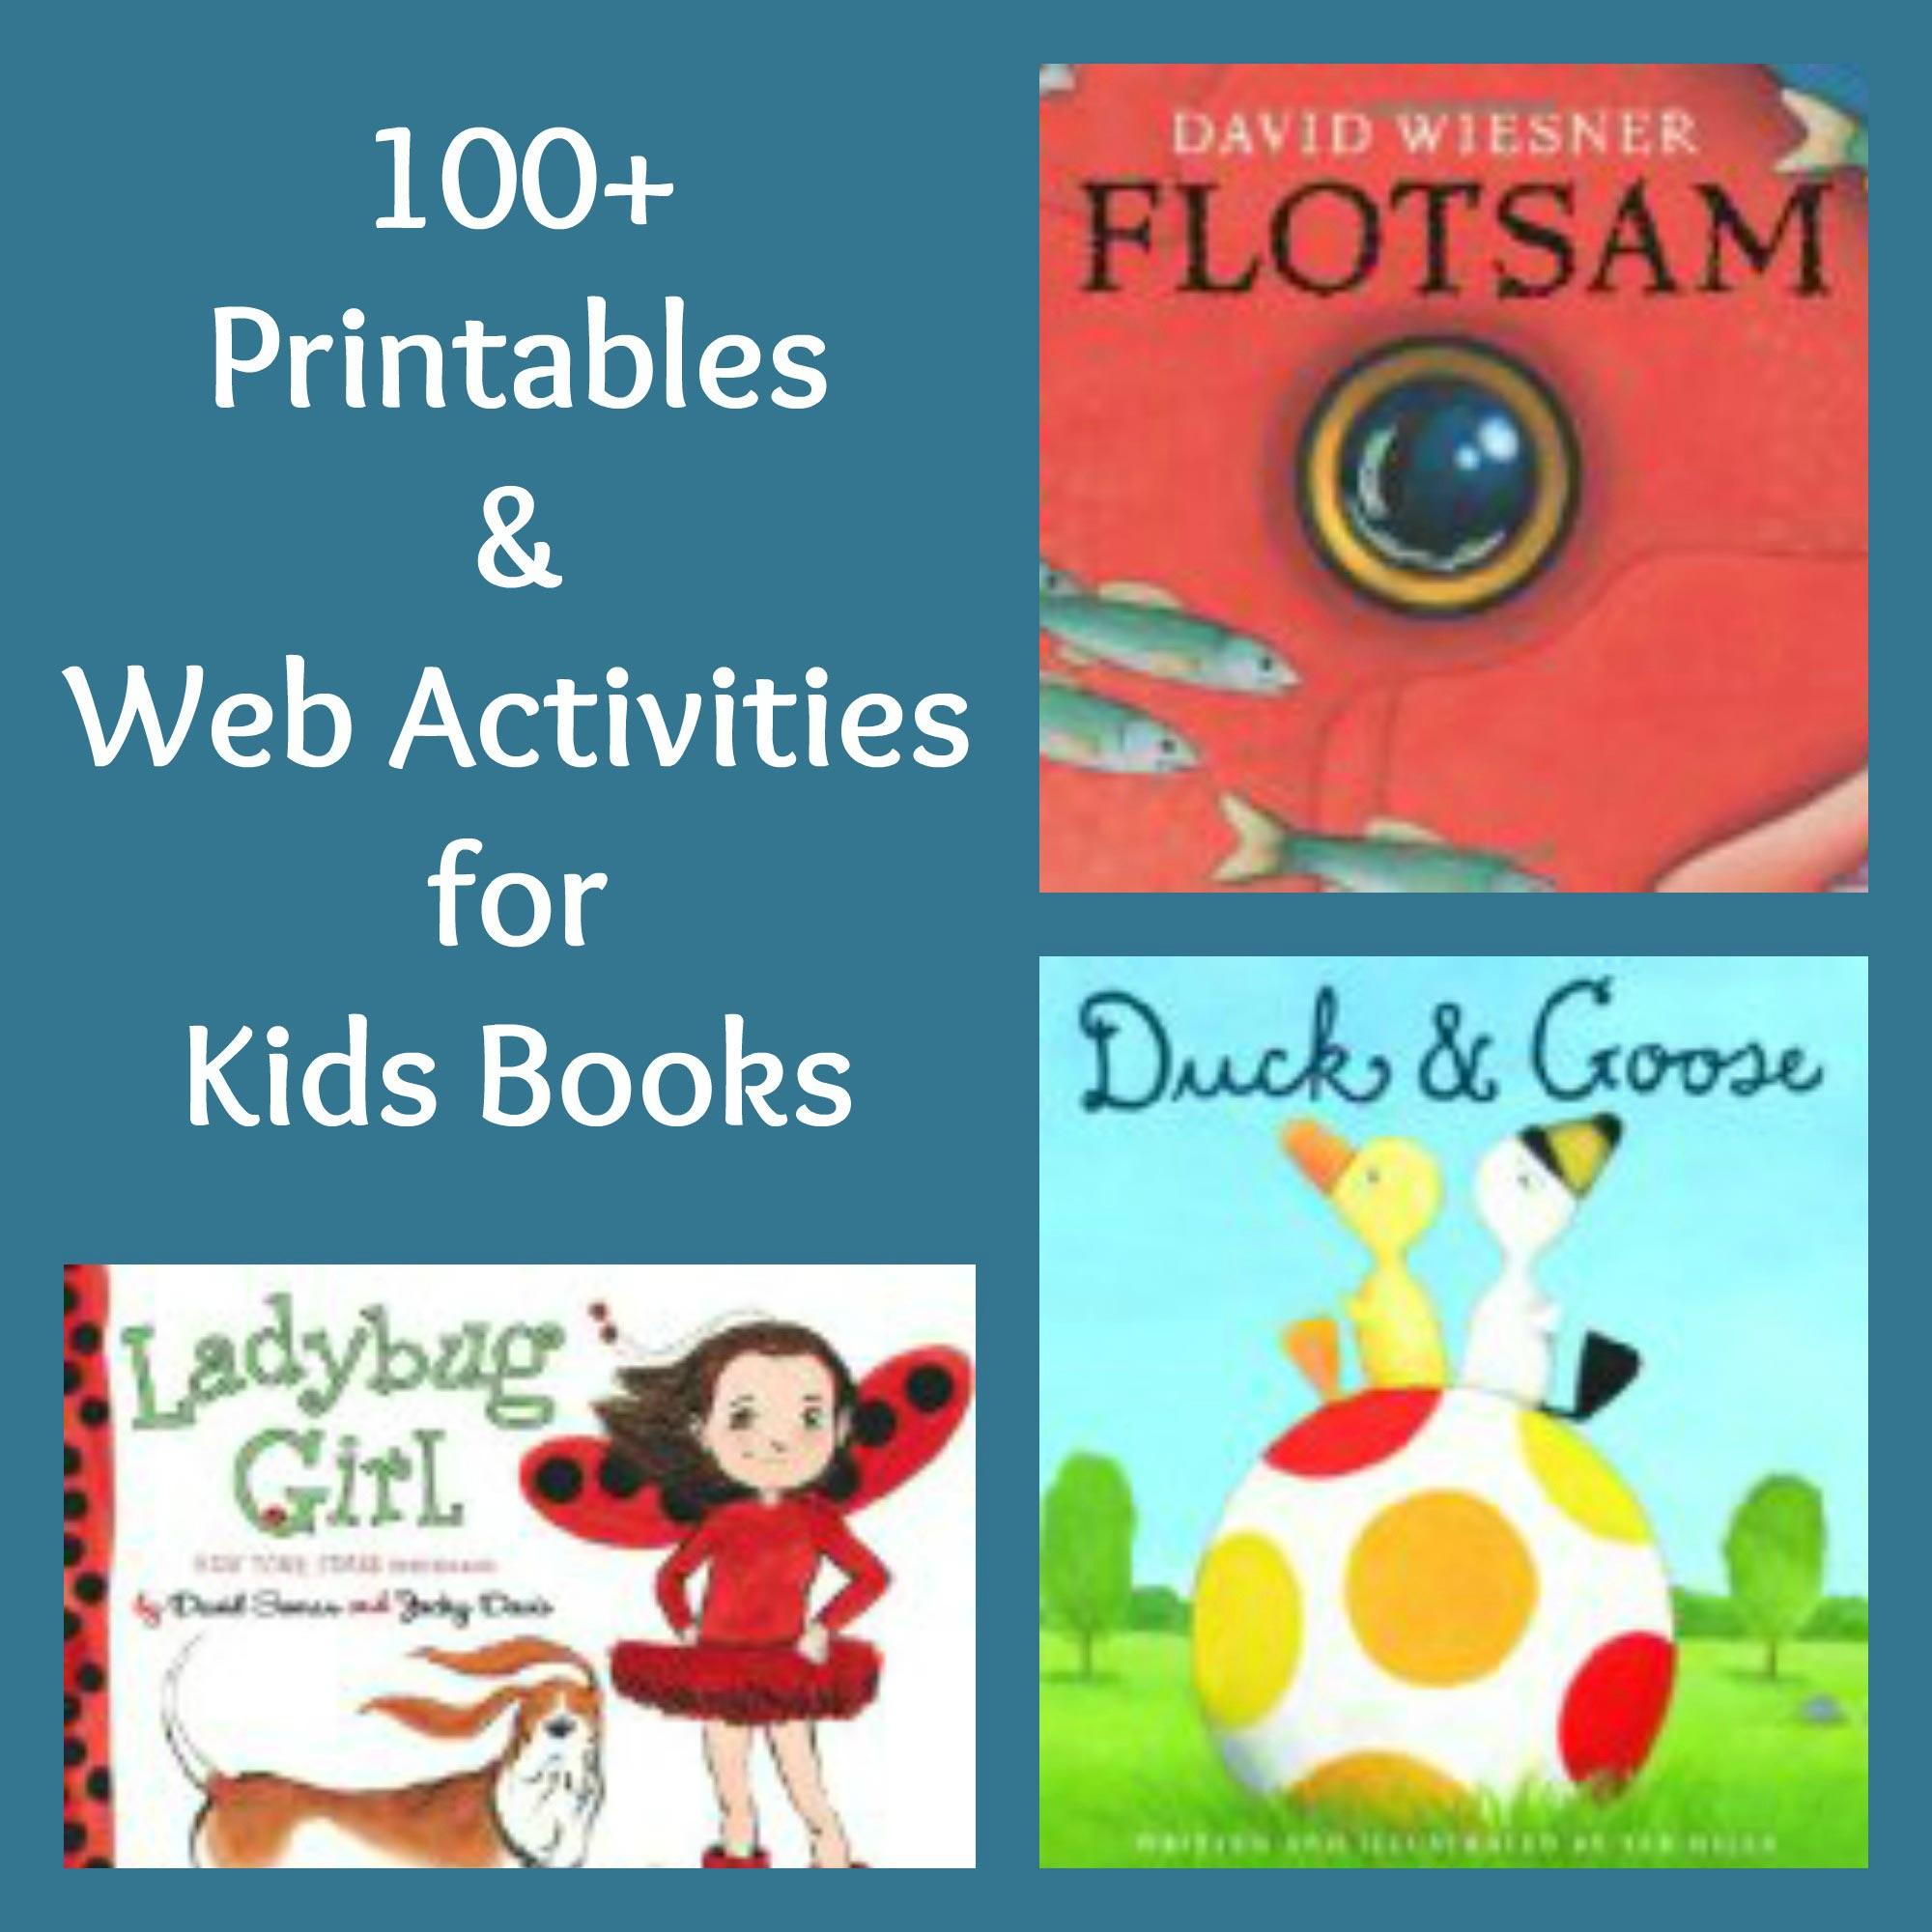 50+ Free Read Aloud Books Online - Edventures With Kids - Kc Edventures - Free Printable Stories For Preschoolers